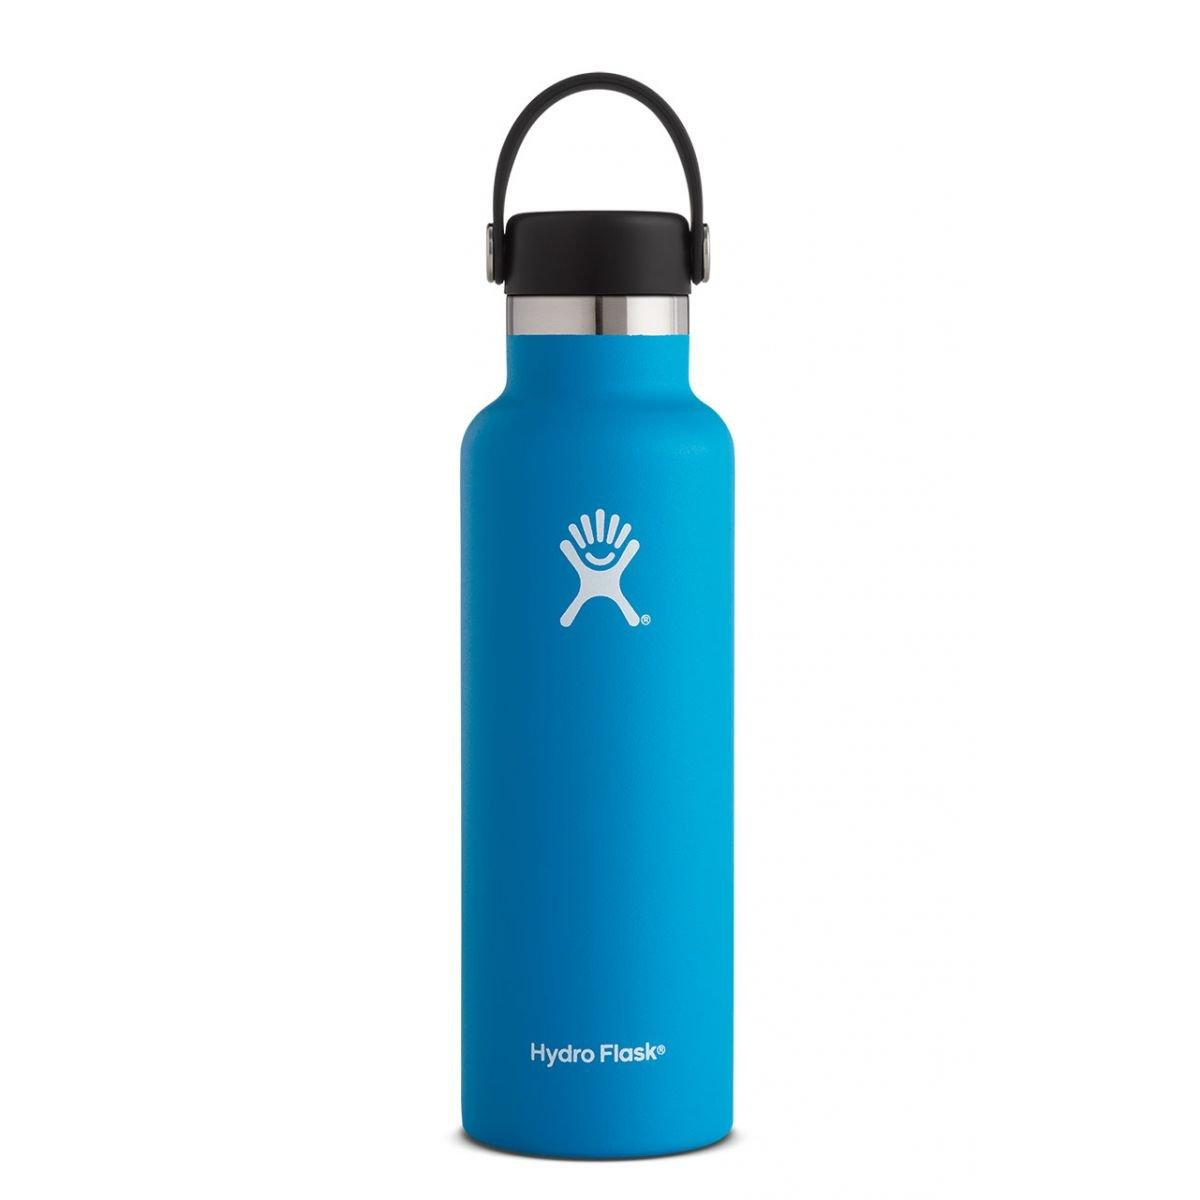 Hydro Flask 21oz Flex Standard Mouth - Alpine